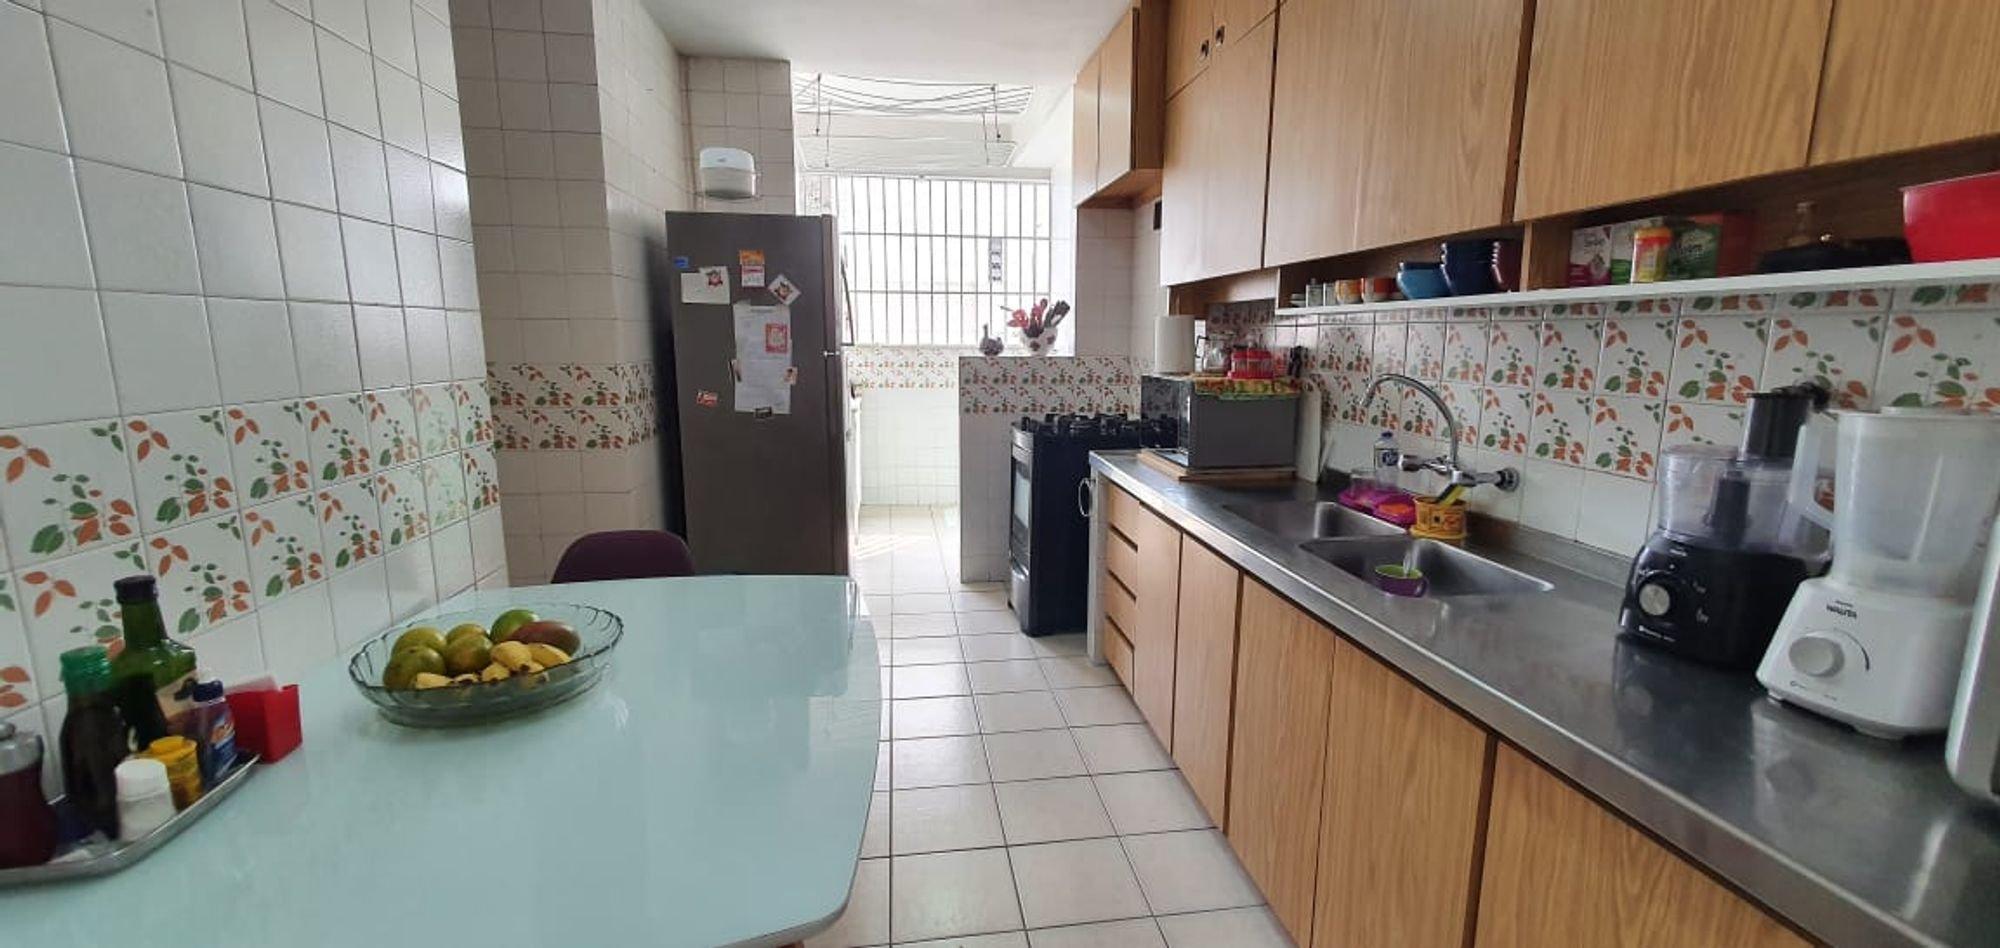 Foto de Cozinha com vaso de planta, cadeira, pia, mesa de jantar, garrafa, tigela, microondas